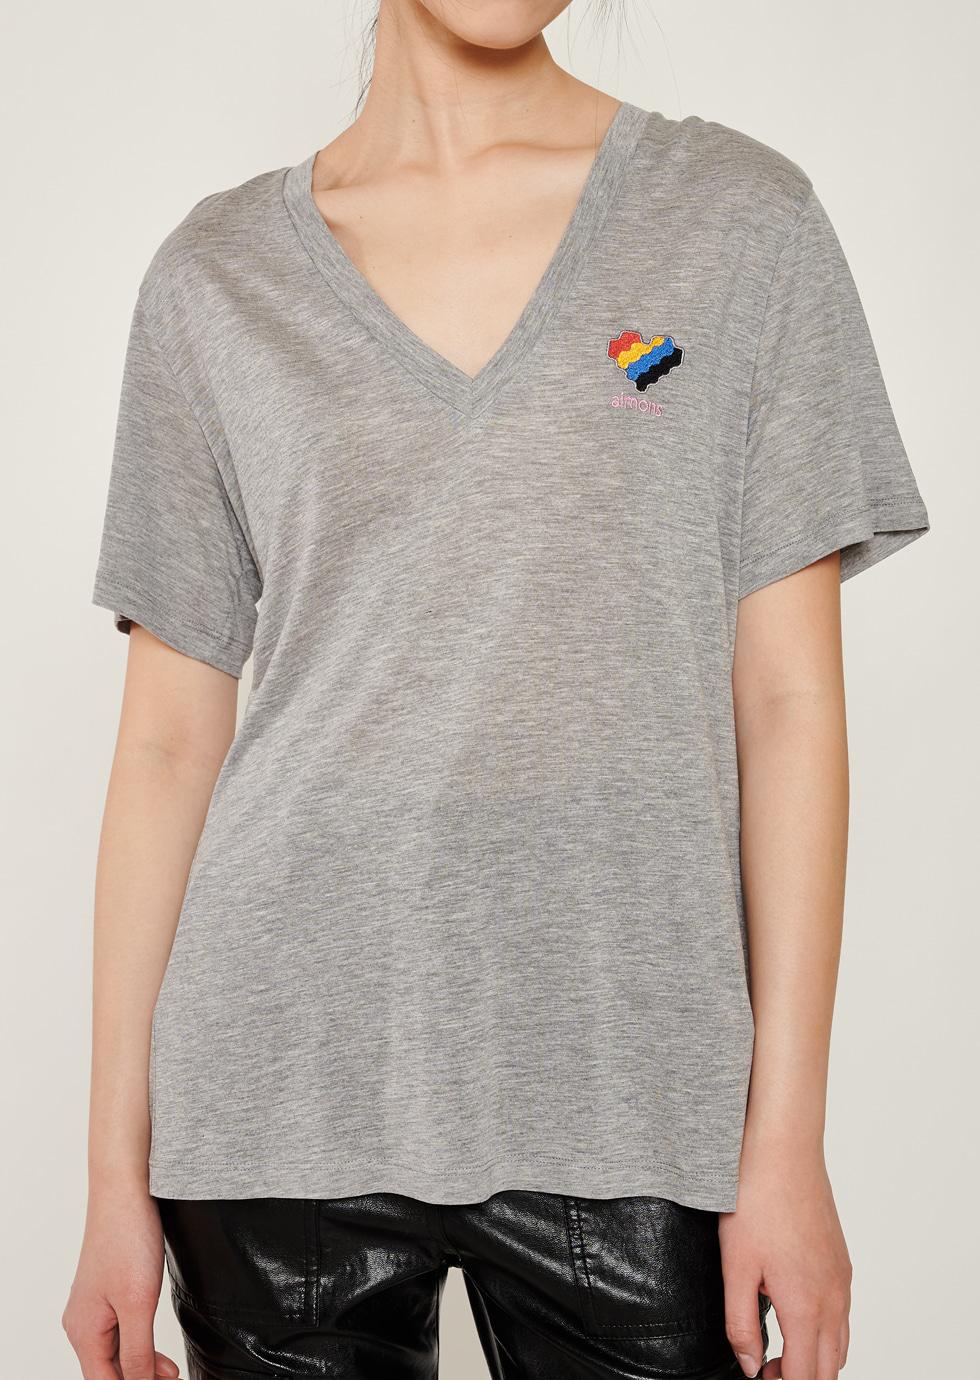 Gray Aimons Heart Symbol Embroidery V-Neck T-Shirts - 에몽 공식스토어  aimons